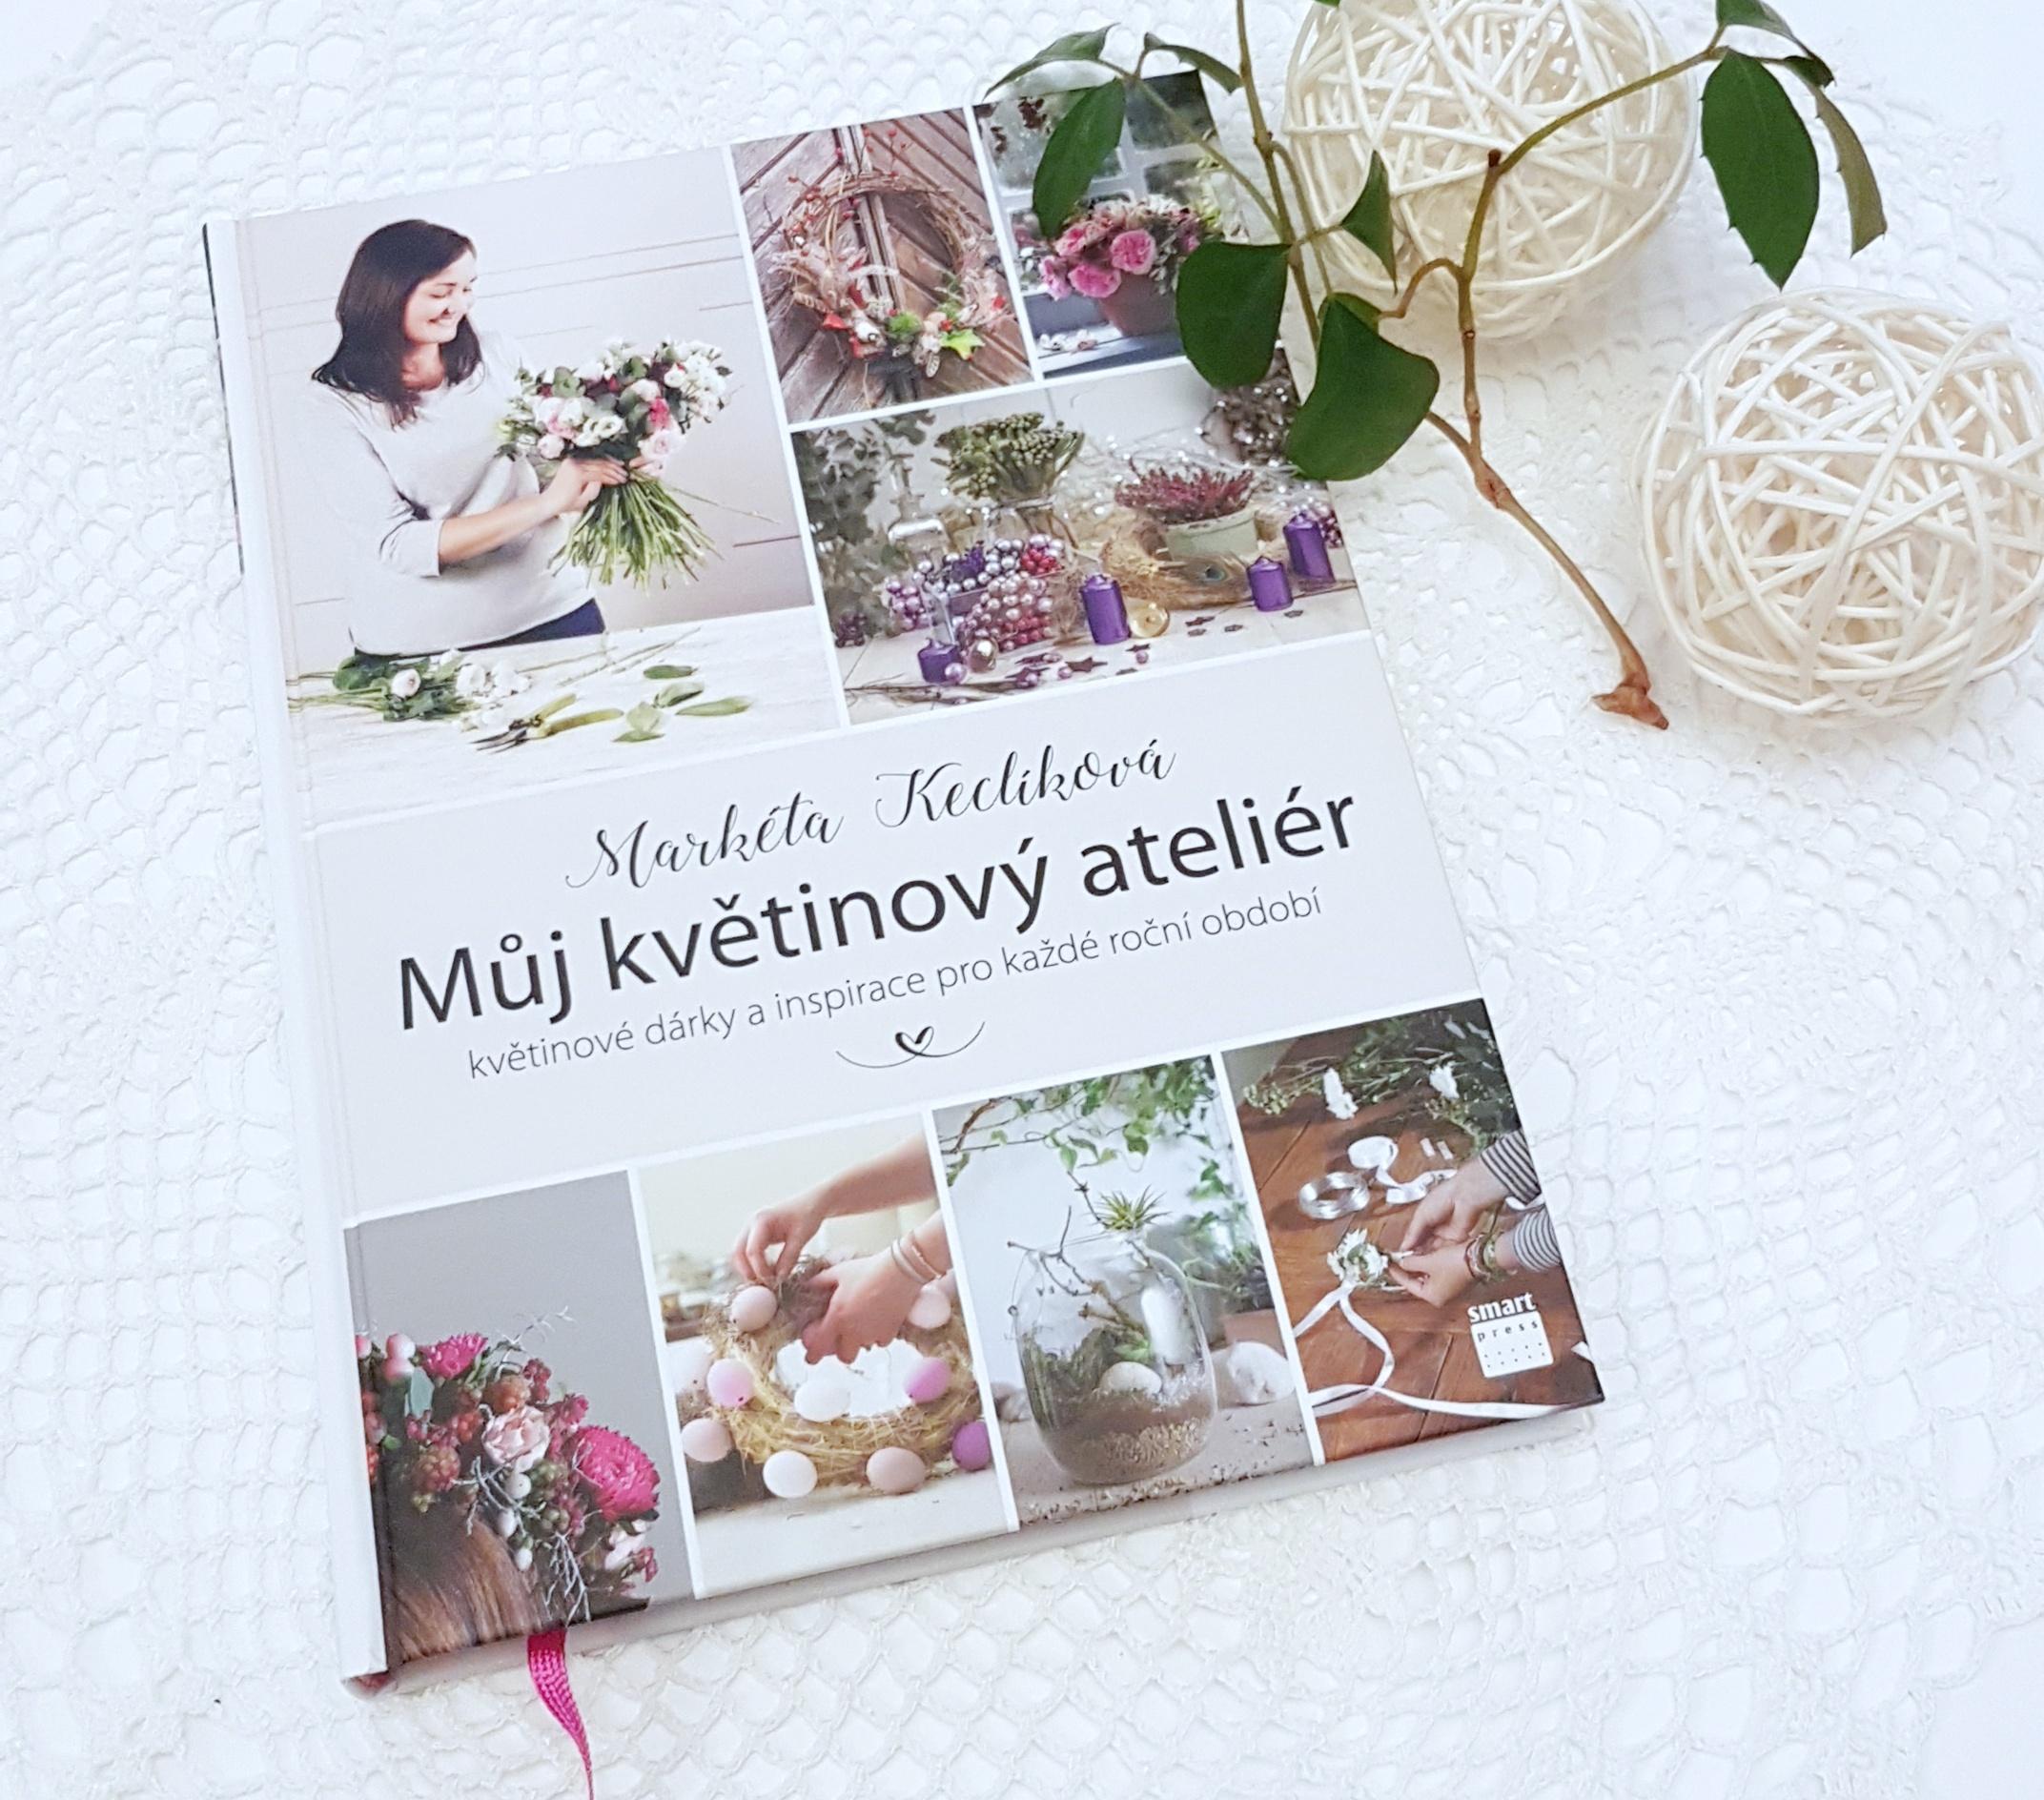 moj-kvetinovy-atelier-okladka